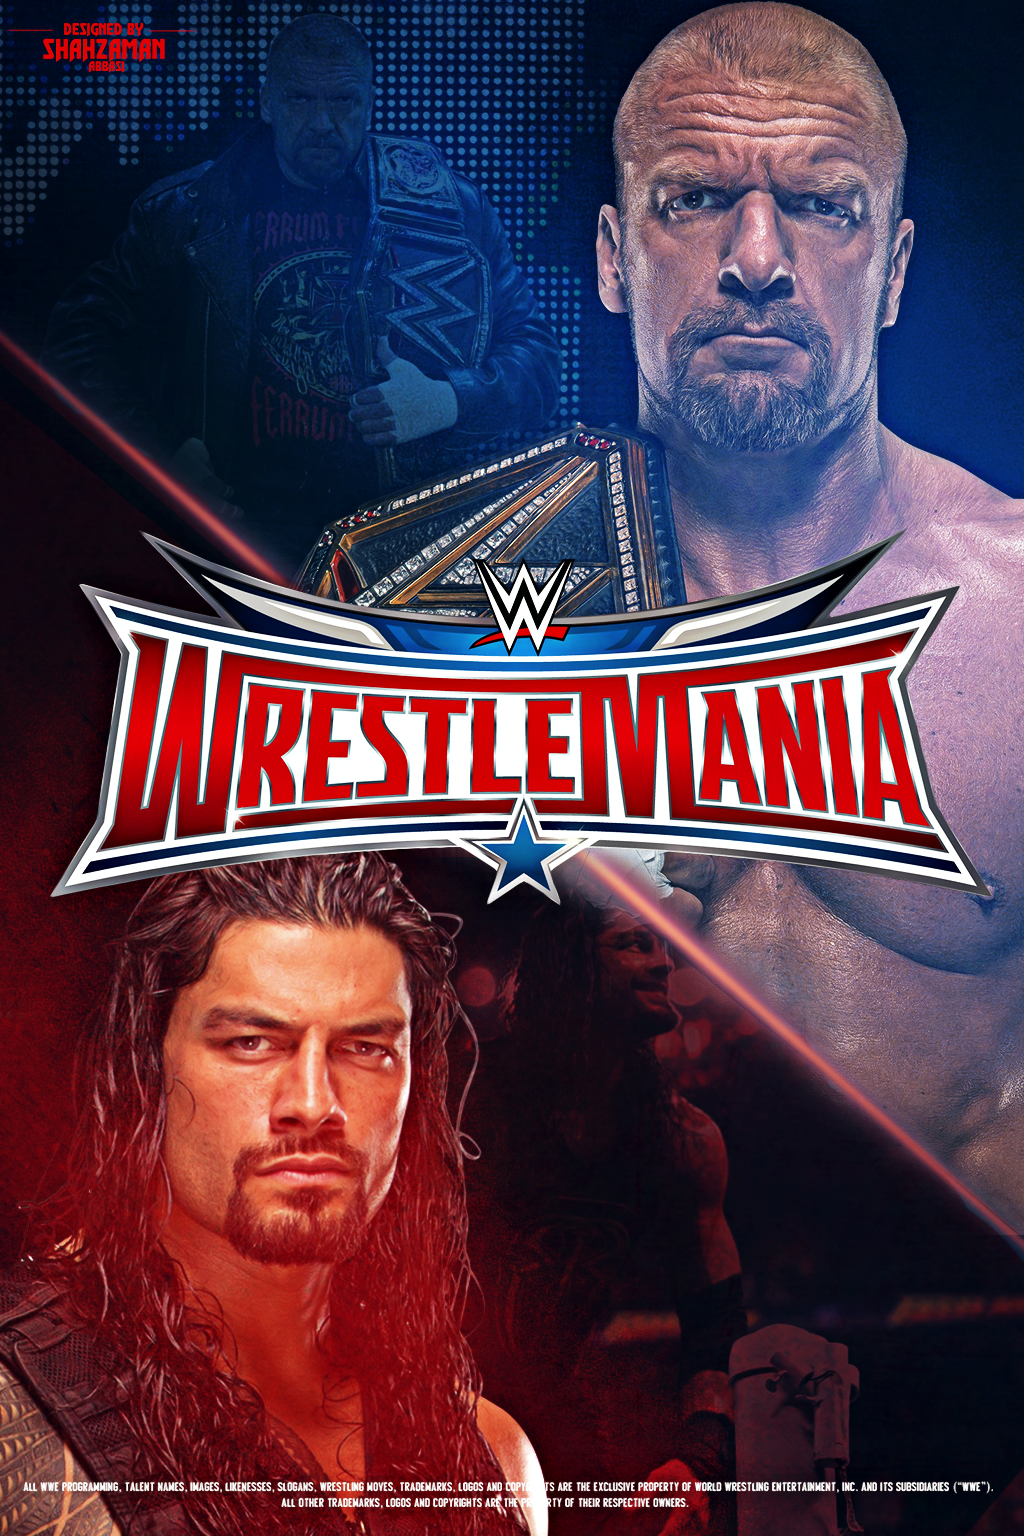 Wrestlemania 32 Poster Wwe Roman Reigns Wrestlemania Wrestlemania 32